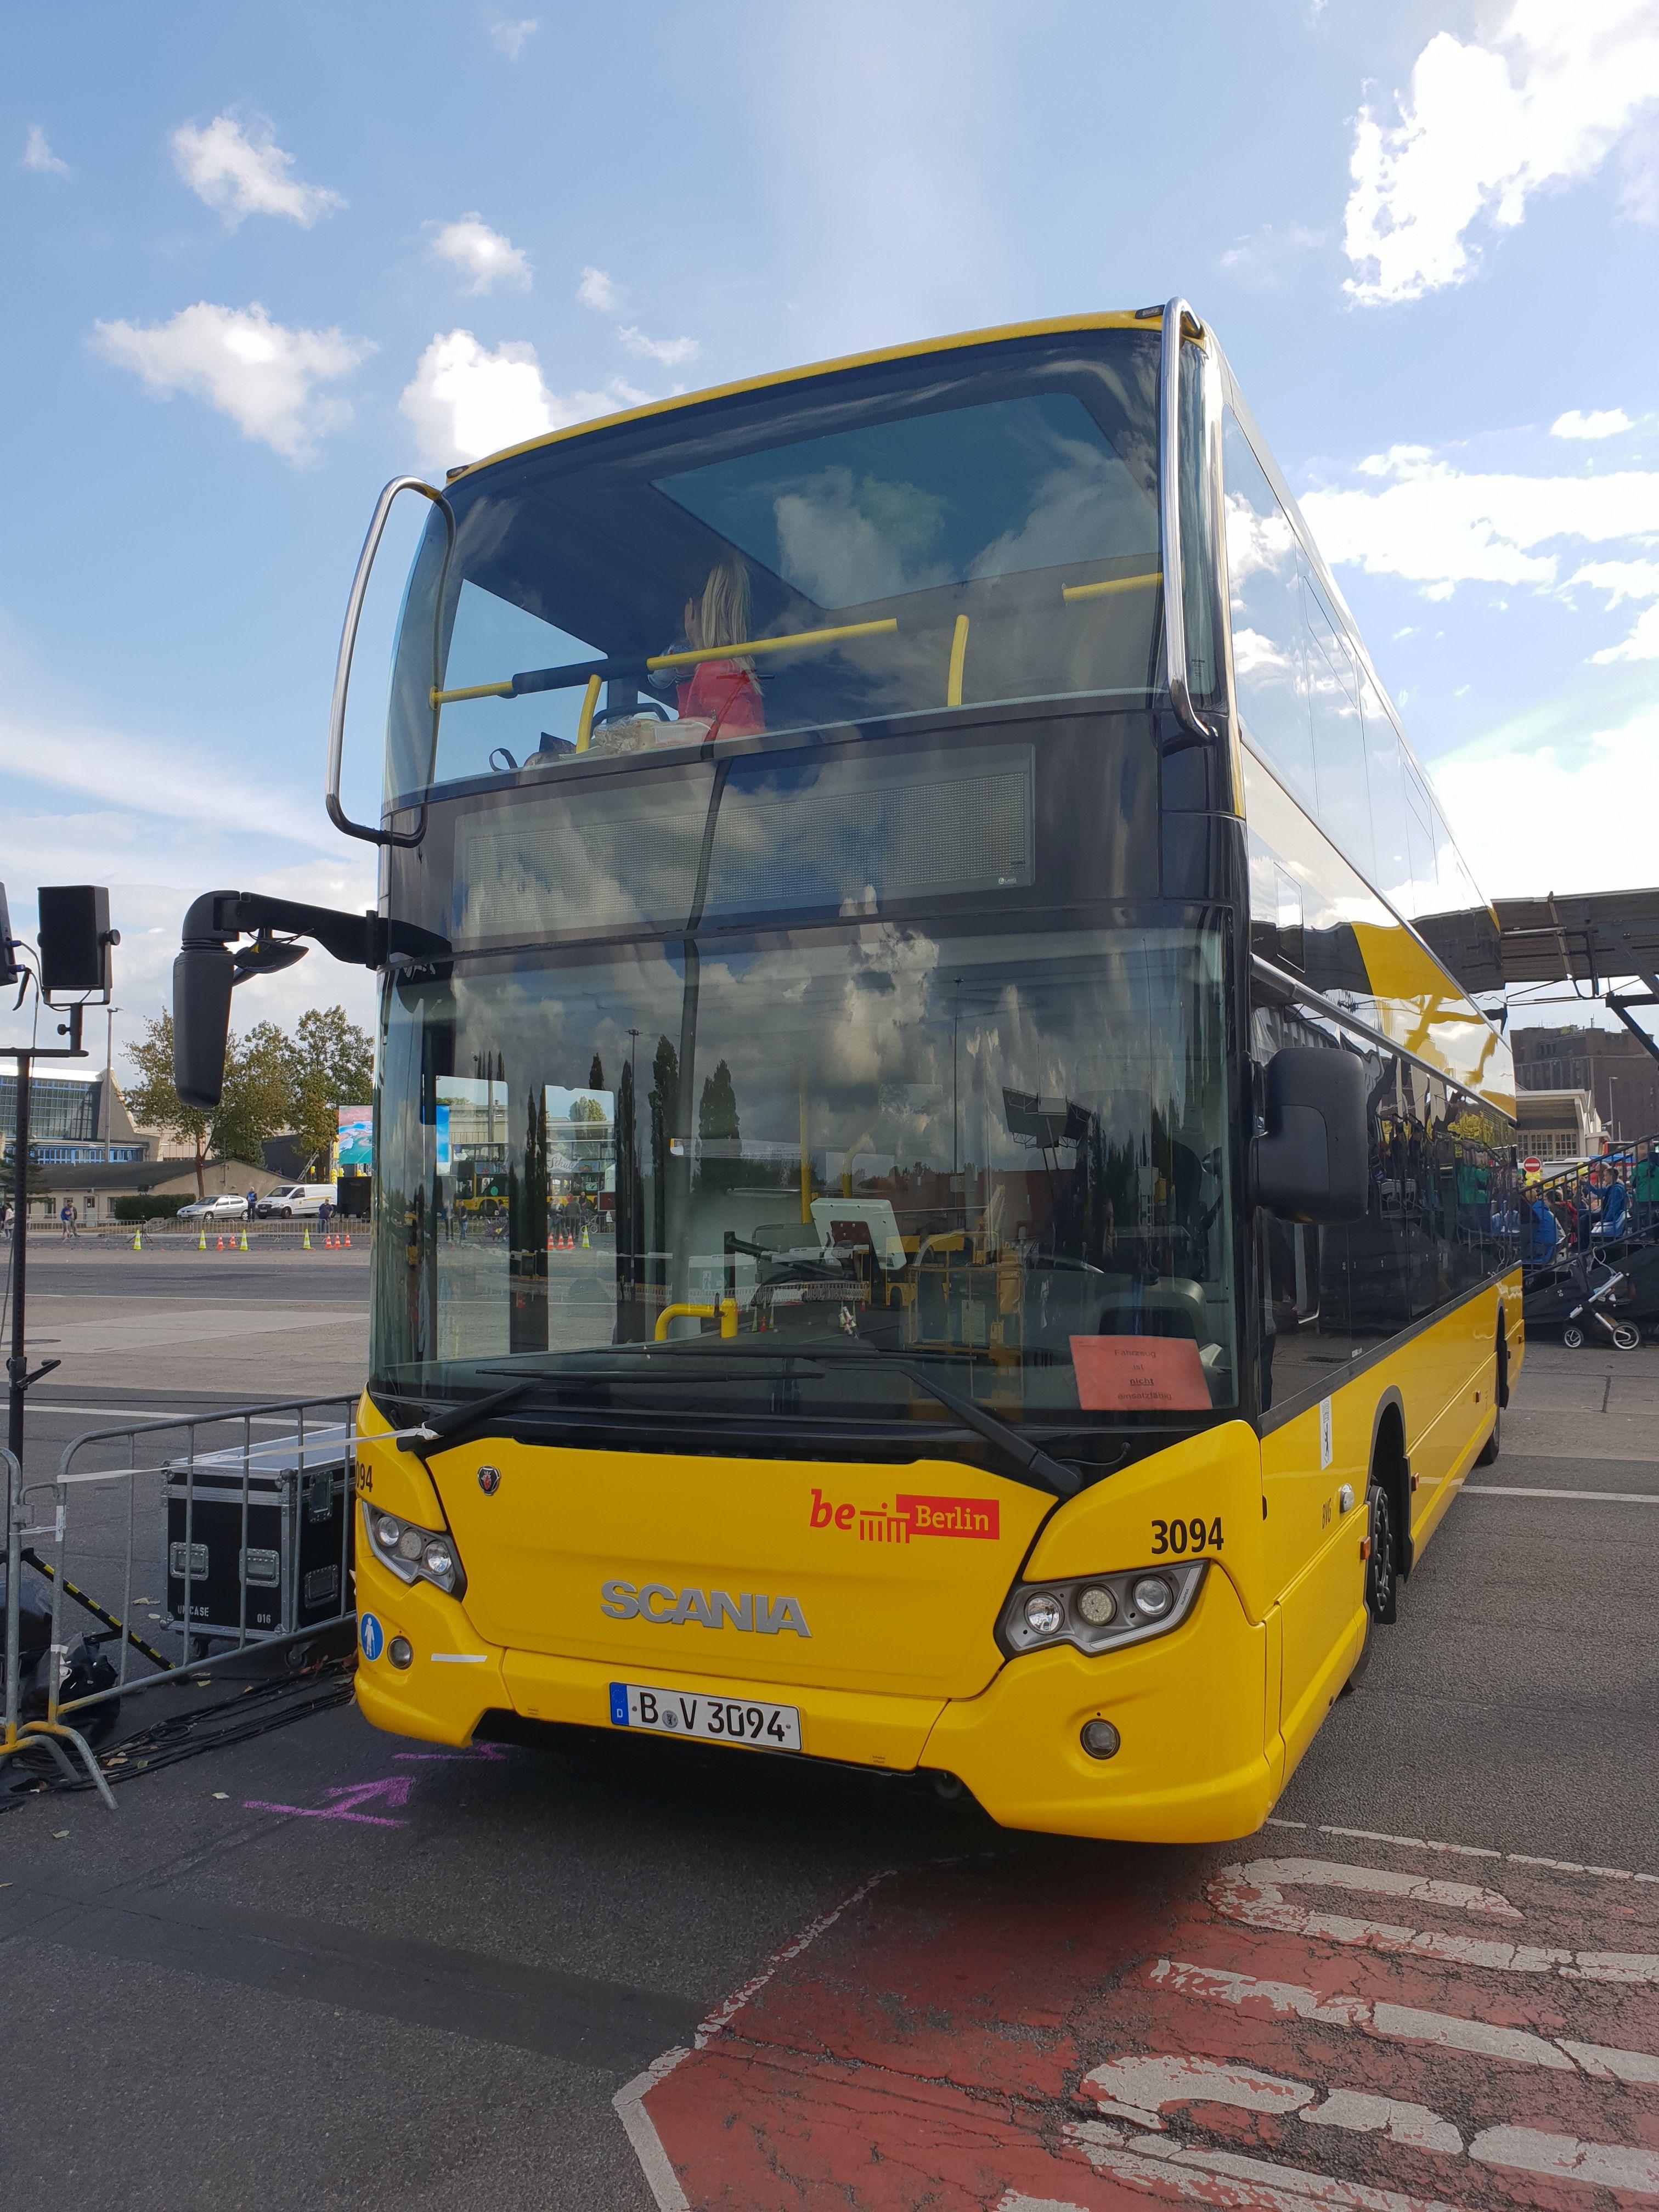 Foto: Bus 3094, Typ Scania Citywide LF, Hof Siegfriedstr., September 2018